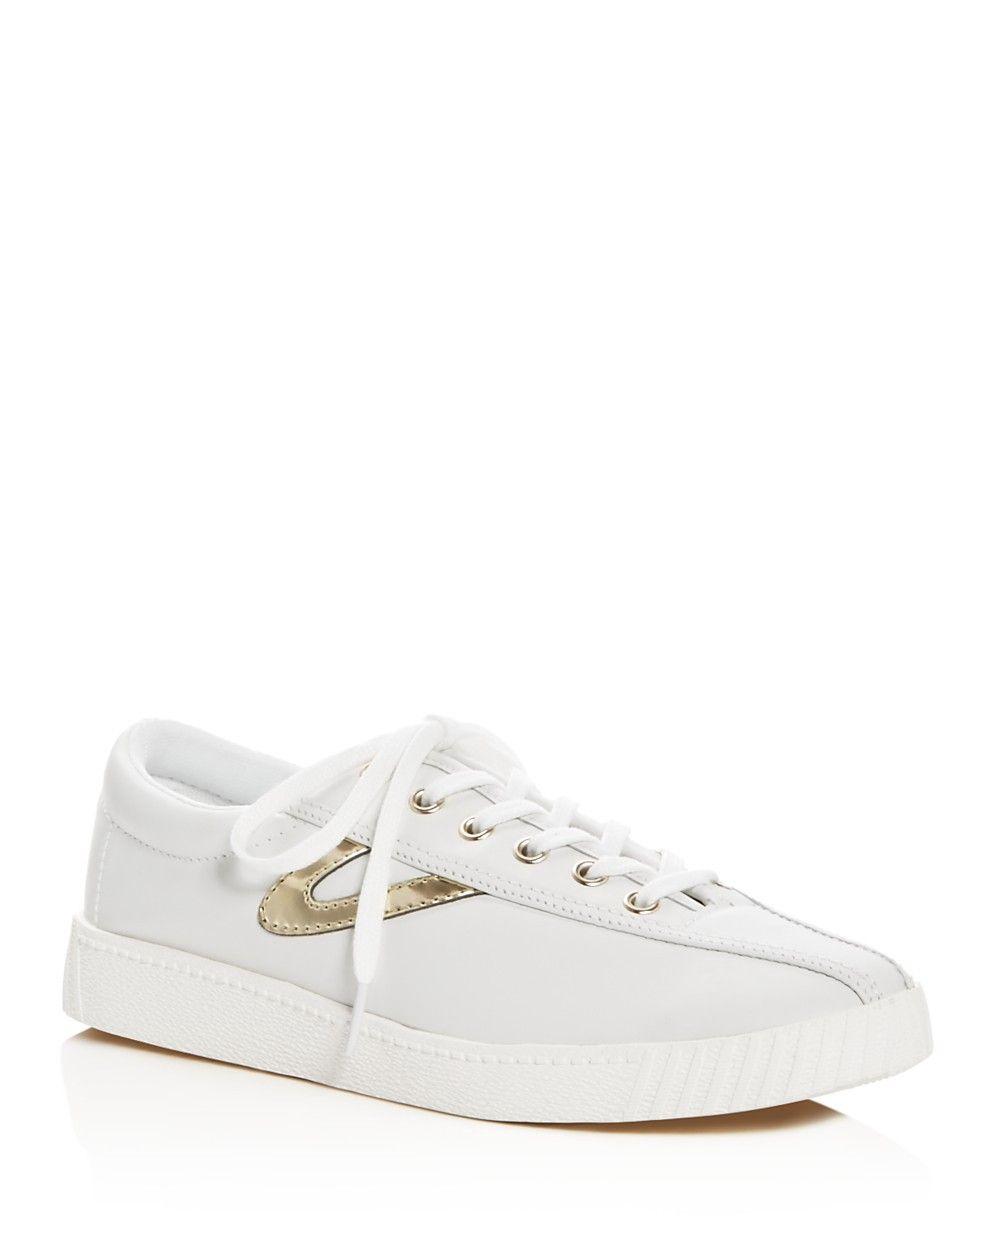 389bf04d8608 TRETORN Tretorn Women's Nylite 2 Plus Metallic Stripe Lace Up Sneakers. # tretorn #shoes #all